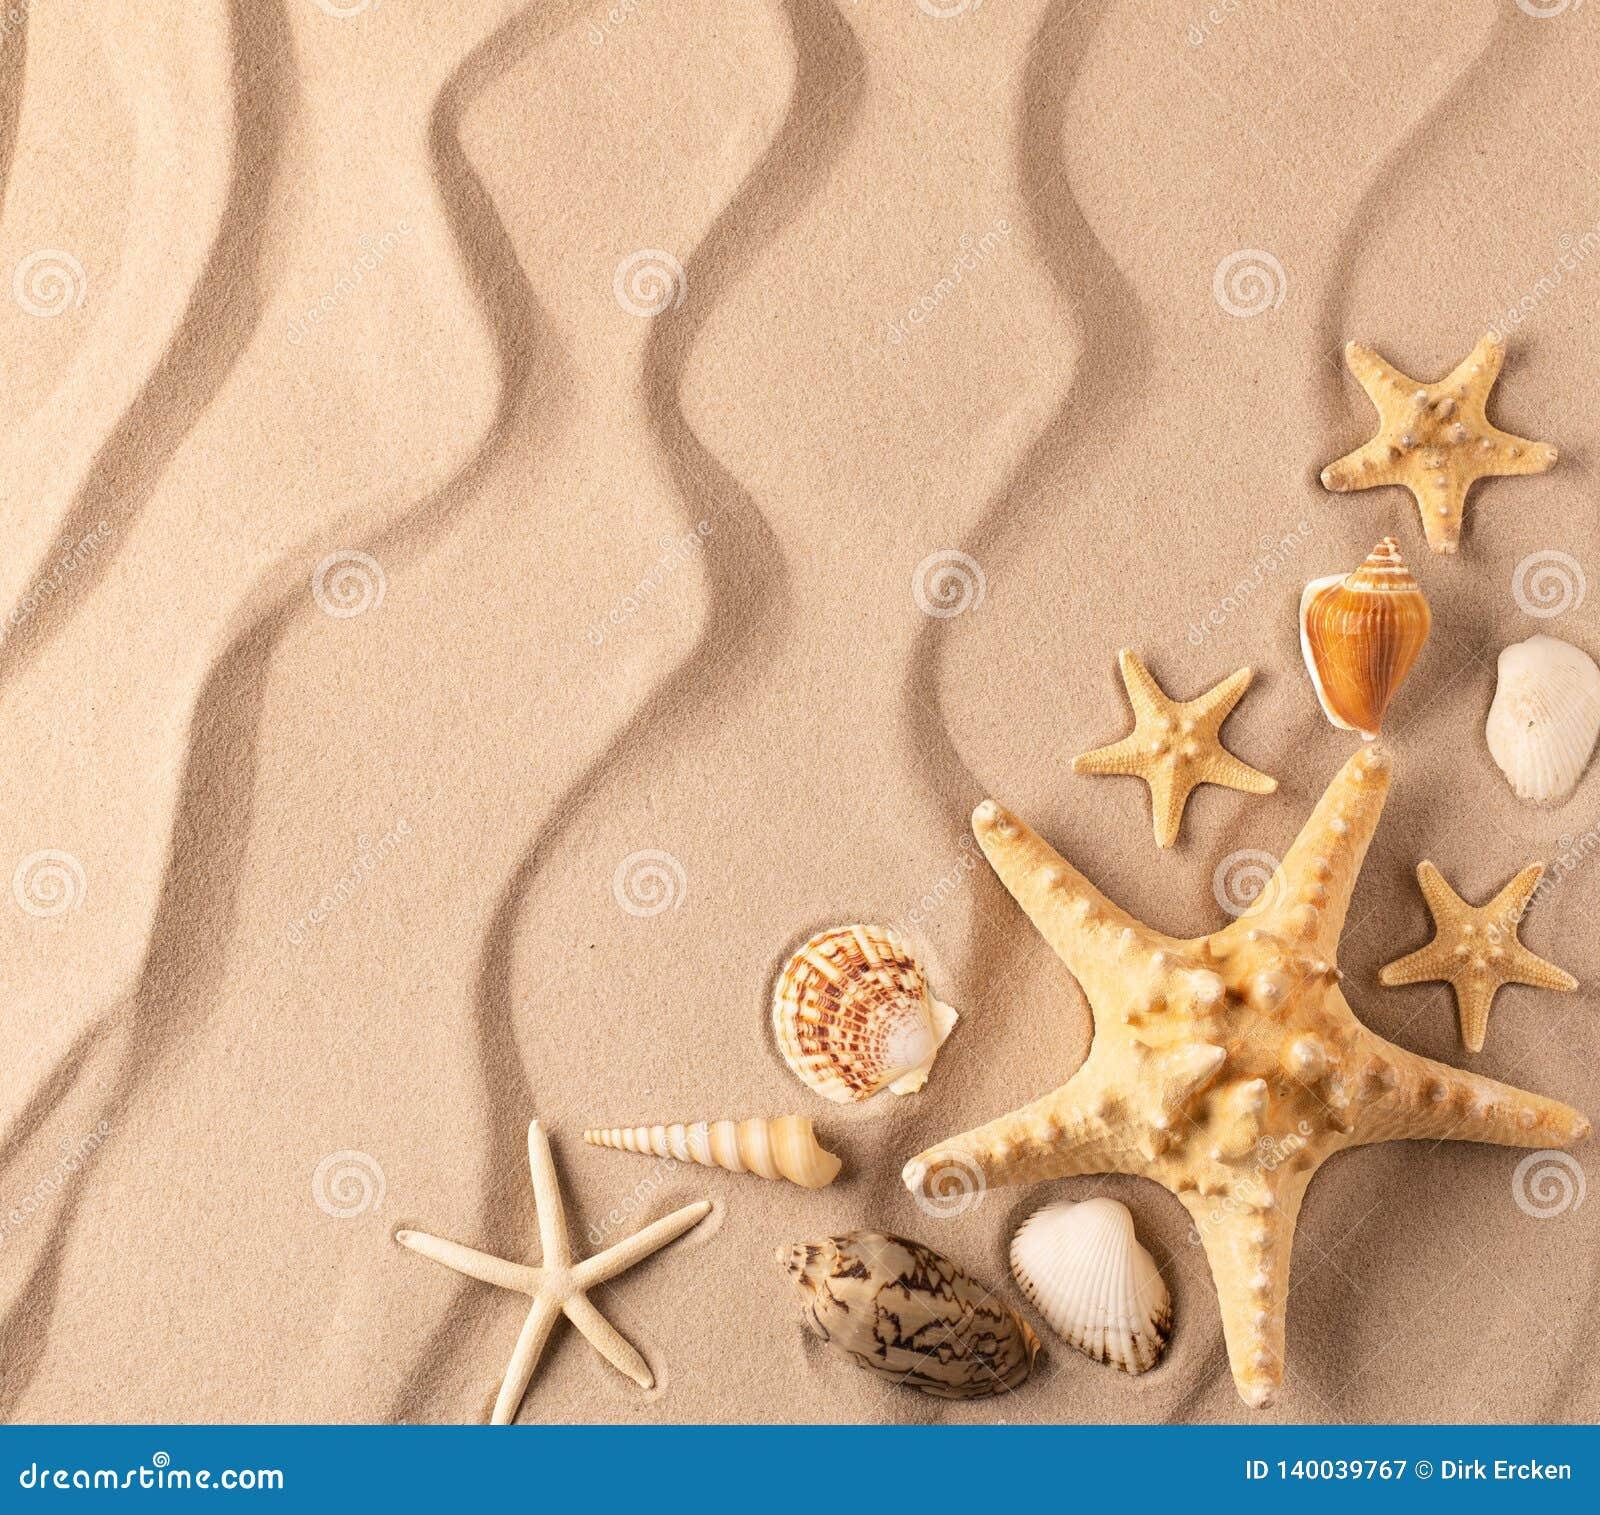 Sea star and shelfish on the rippled sand